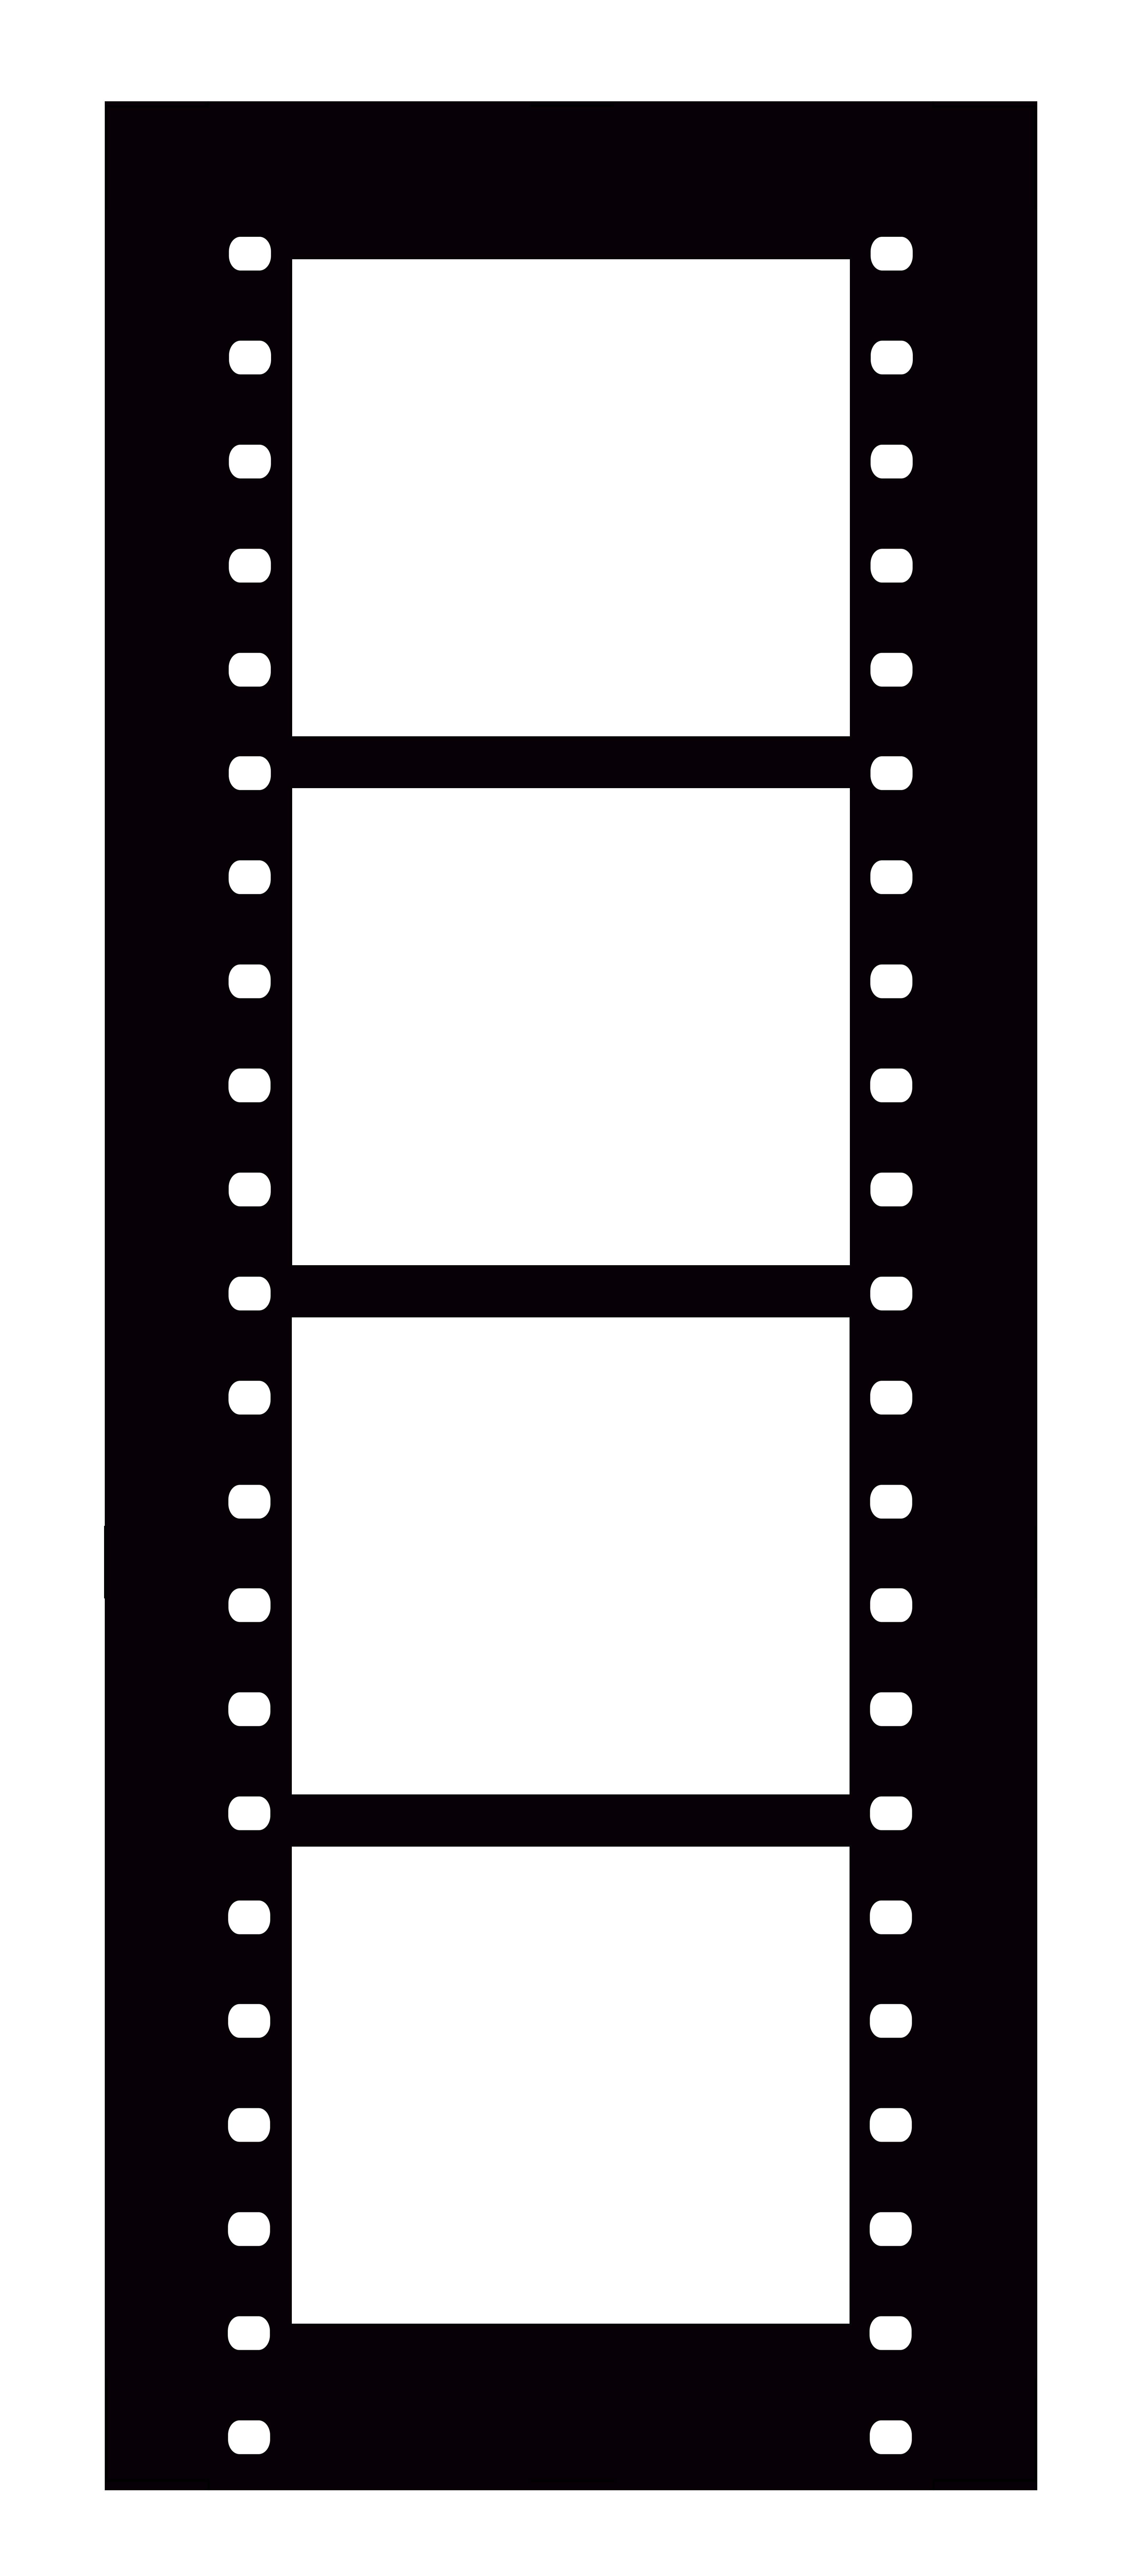 3300x7452 Film Strip Canvas Photos On Film Wall Decor Artwork Blossom